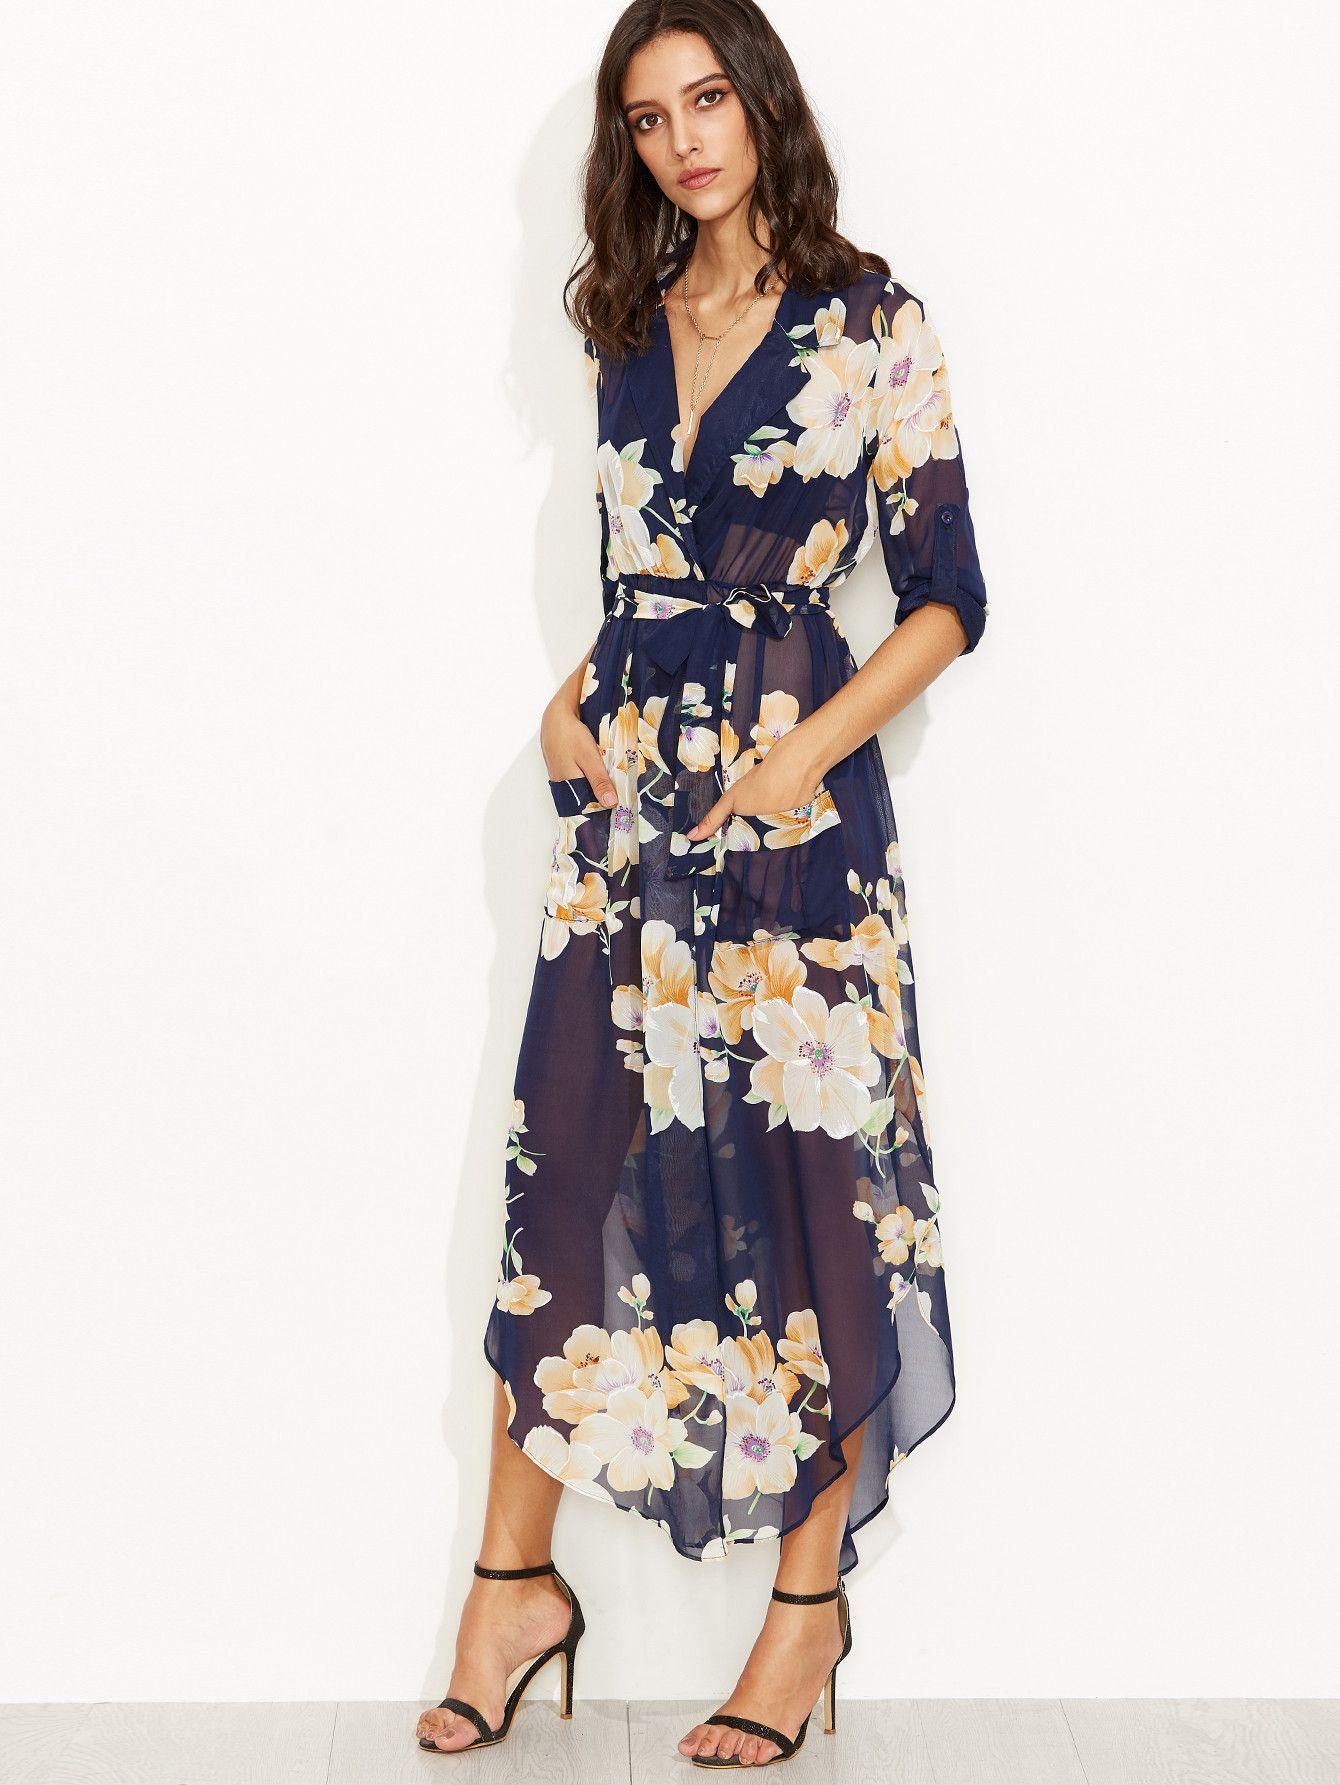 3b618d019 Boho Navy Floral Print Tie Wrap Chiffon Dress | Summer Attire - Maxi ...